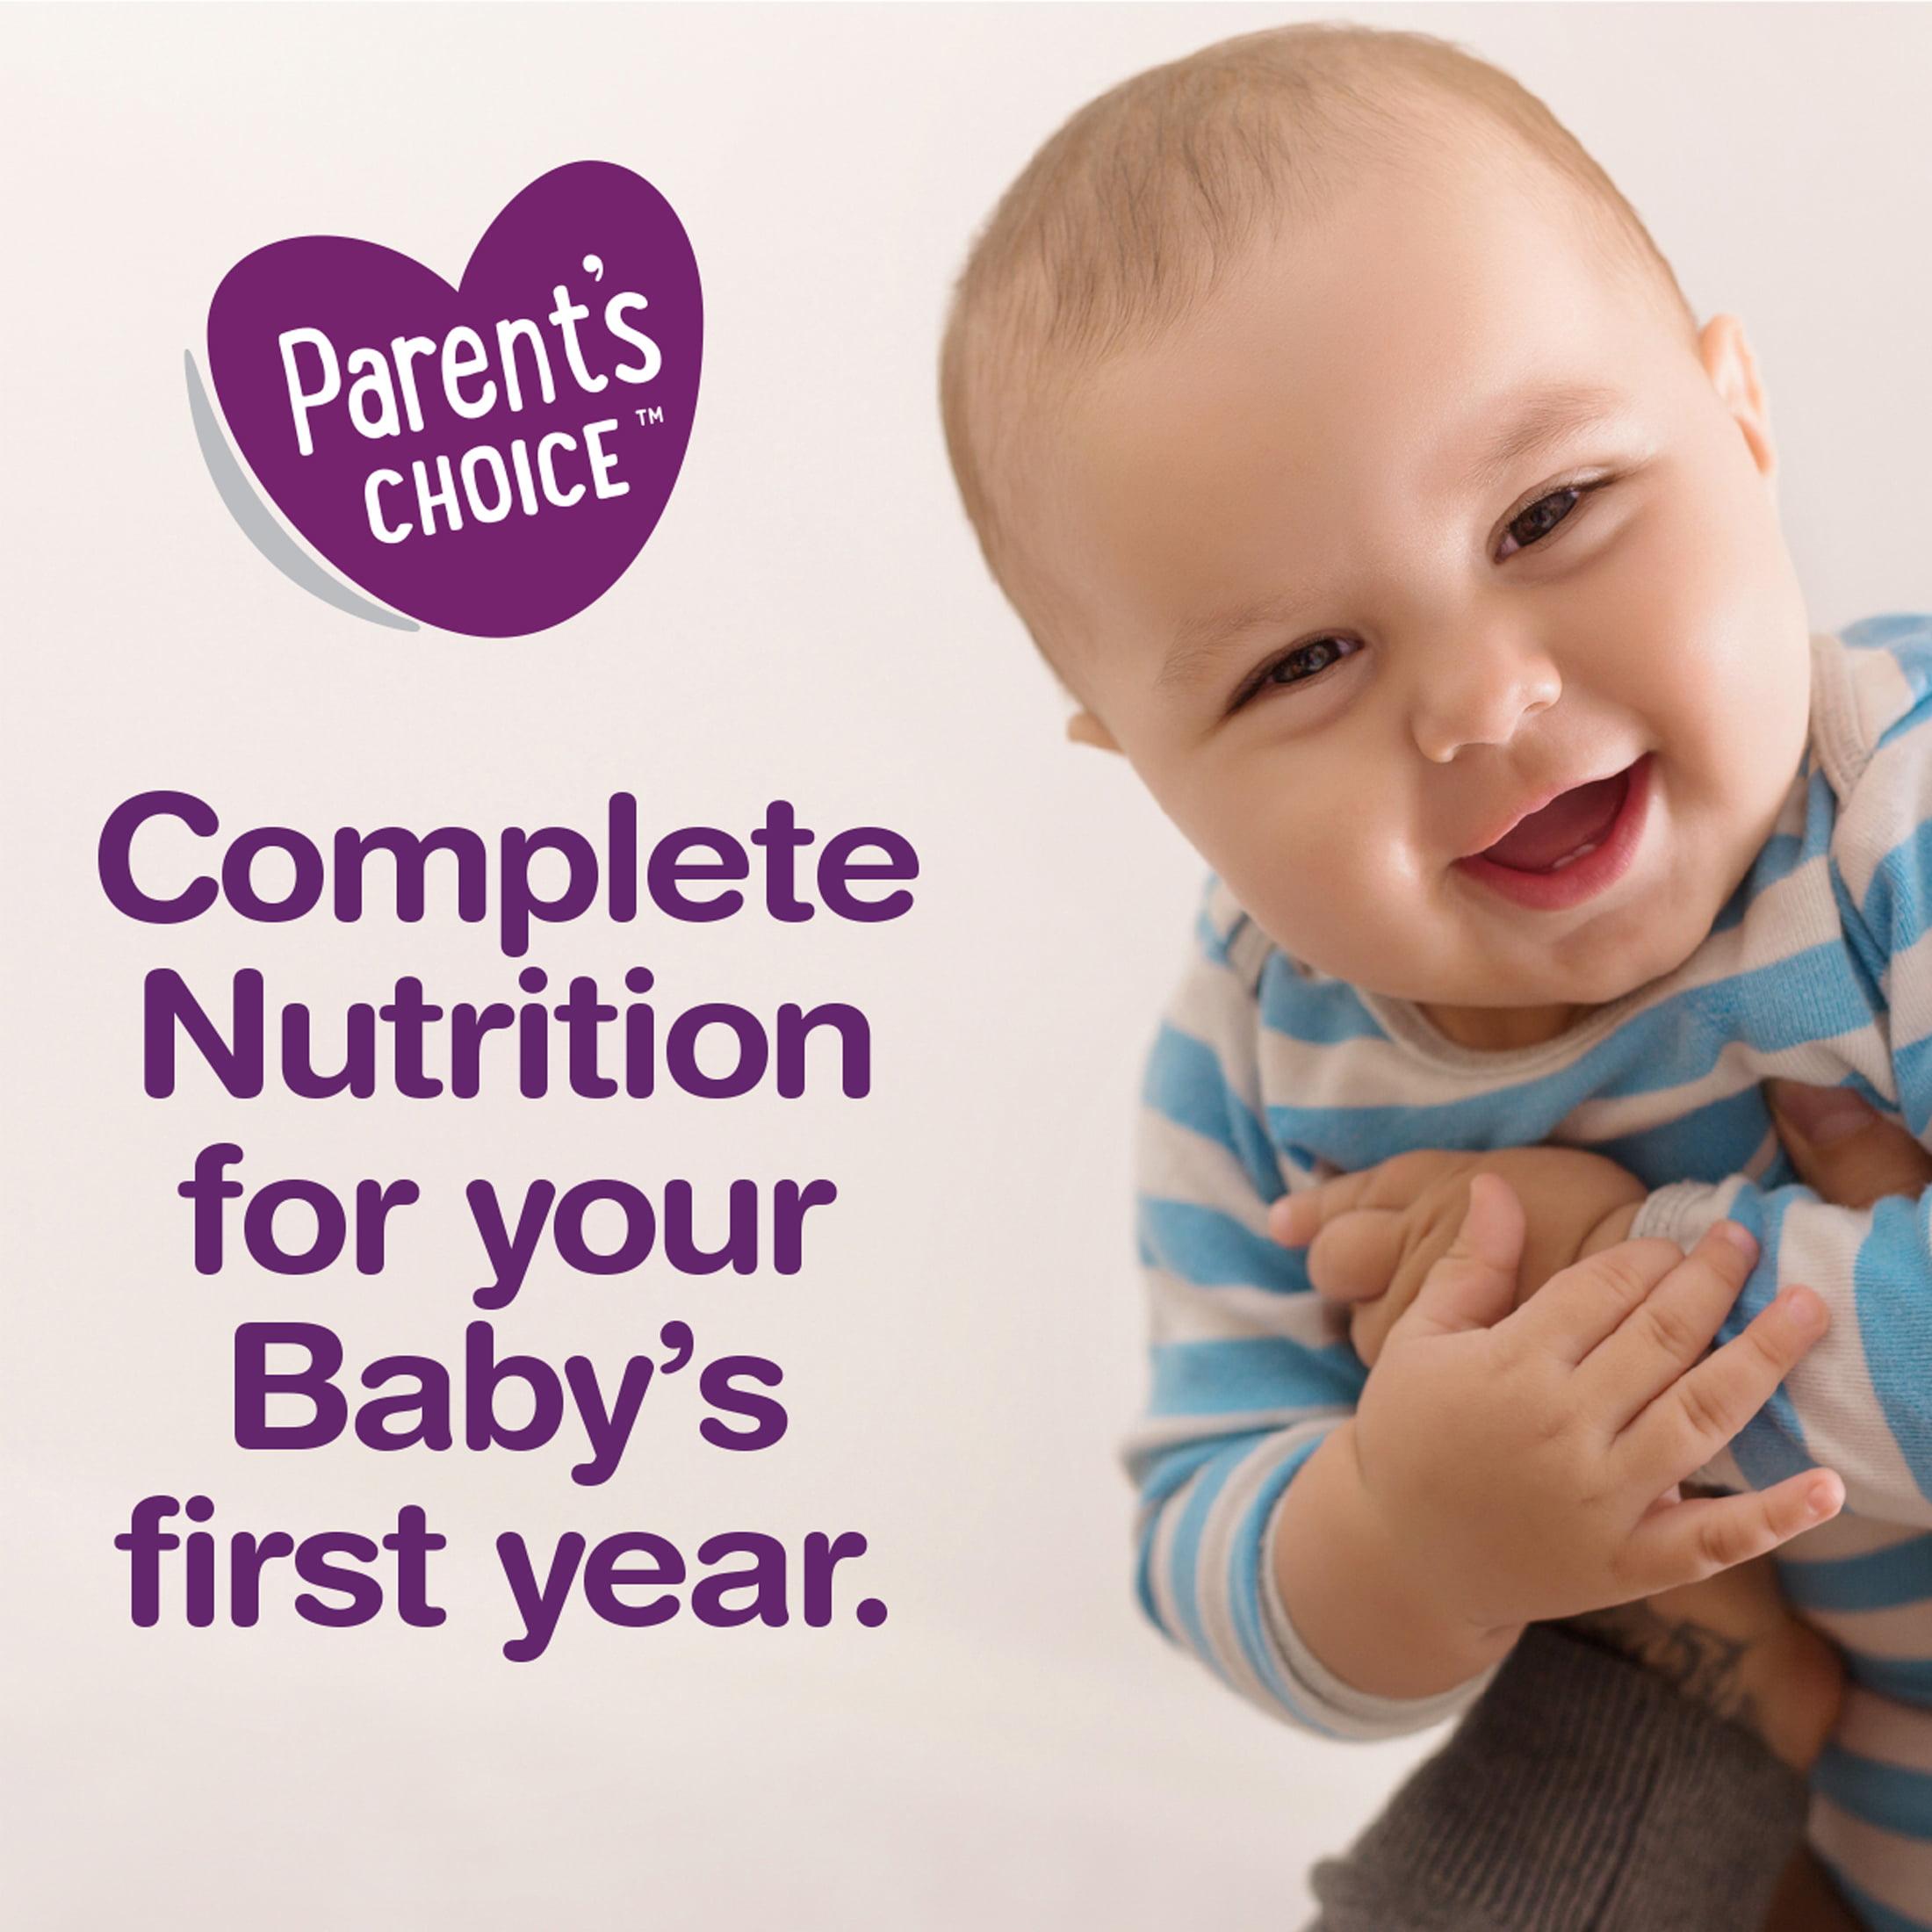 Parent S Choice Gentle Powder Baby Formula 34 Oz Canister 4 Non Gmo Milk Based With Iron Walmart Com Walmart Com